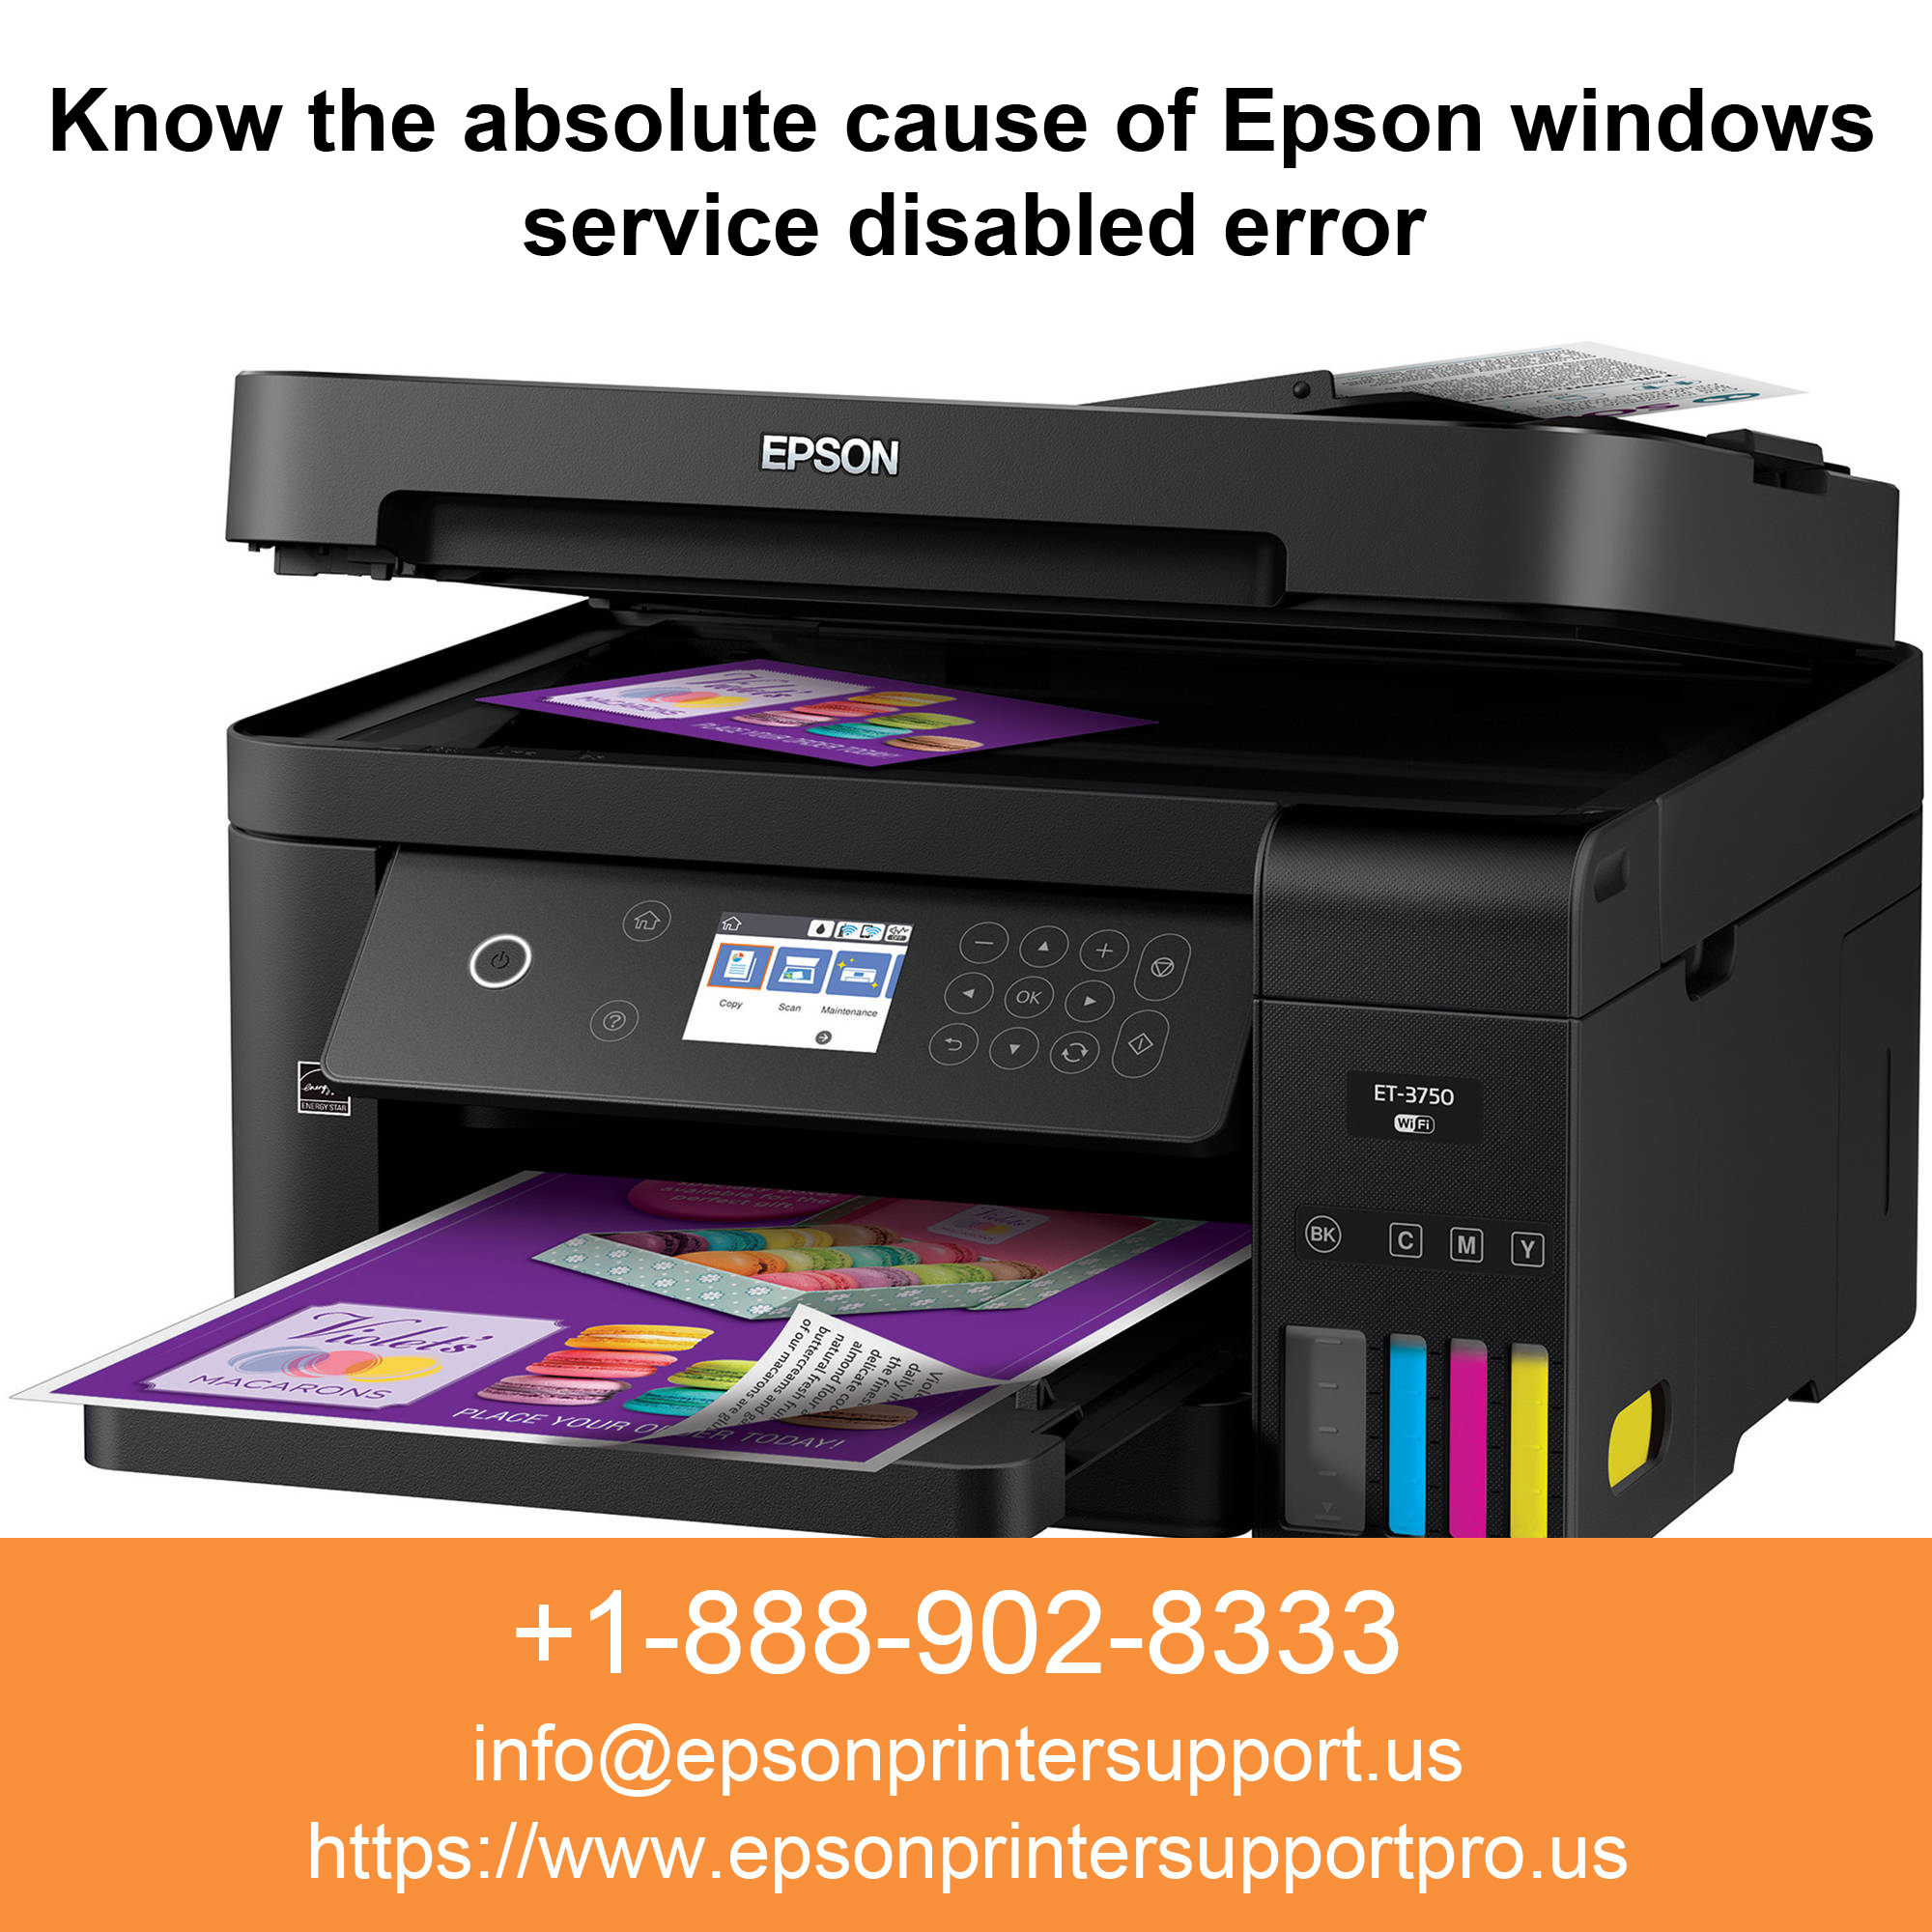 1-888-808-2666 Epson windows service disabled error